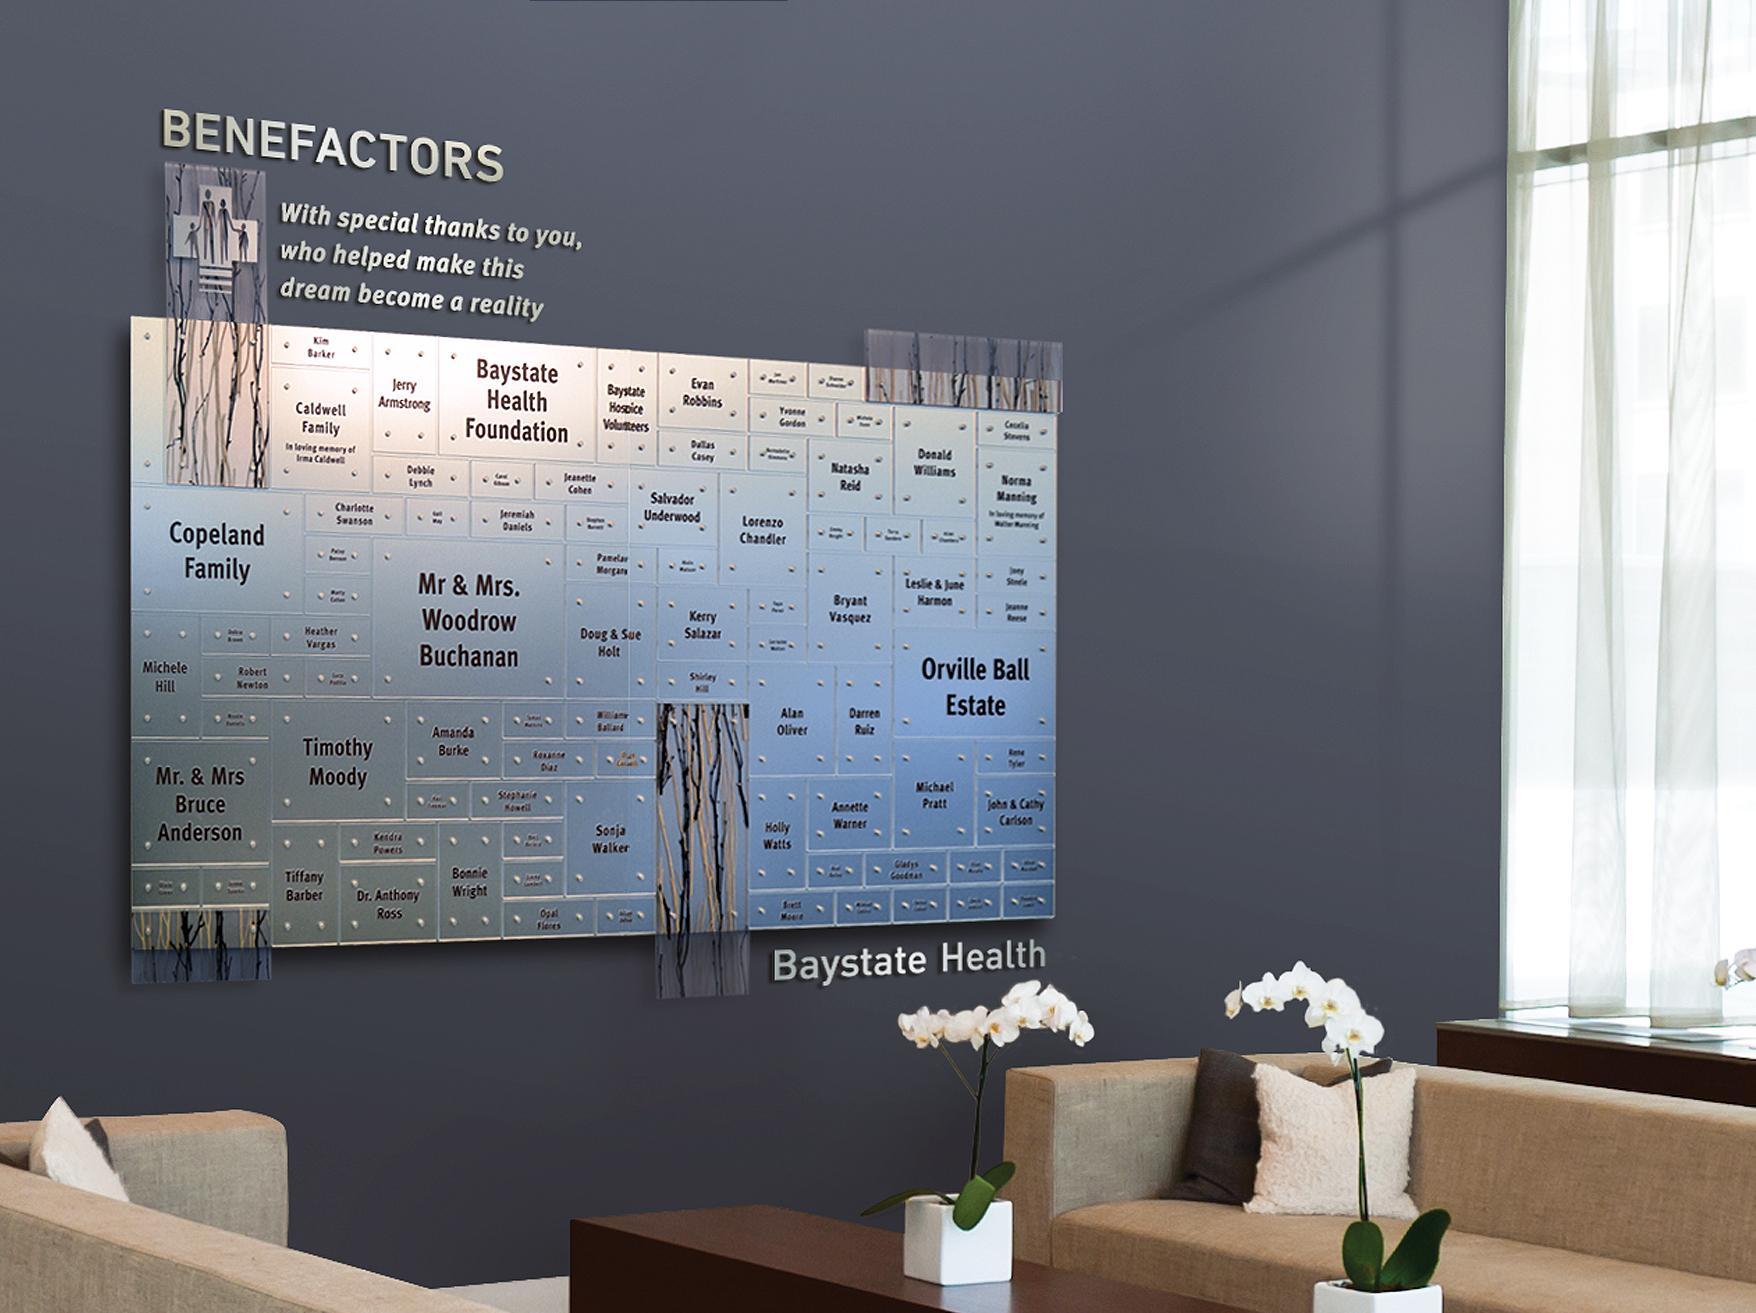 Photo of Baystate Health benefactor wall